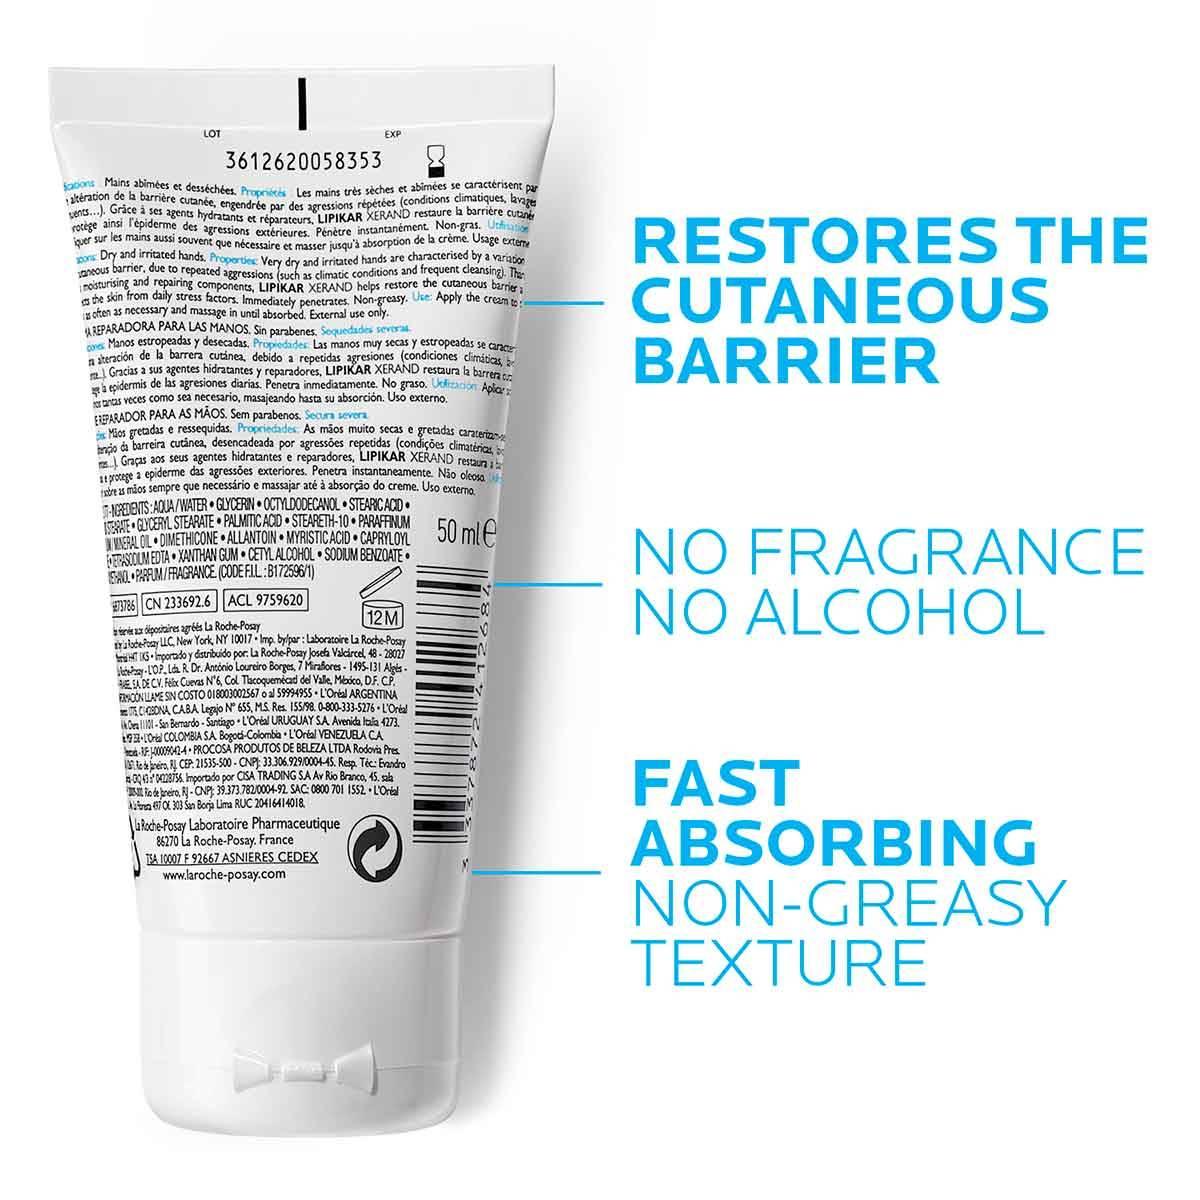 La Roche Posay ProductPage Eczema Lipikar Xerand 50ml 3337872412684 Zo